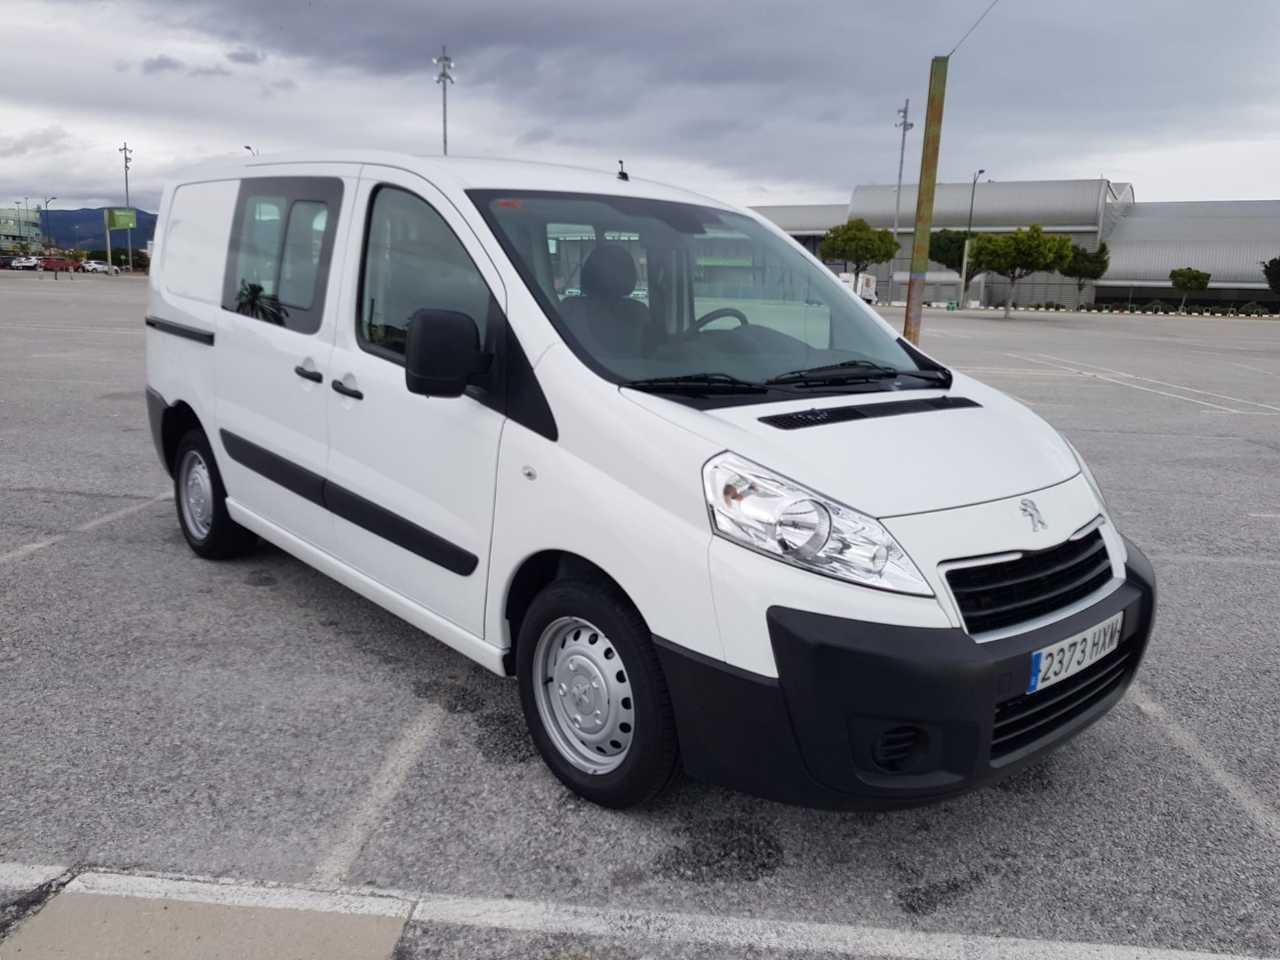 Peugeot Expert 1.6 HDI COMBI 6 PLAZAS MUY EQUIPADA CERTIFICADO DE KM Y CARROCERIA  - Foto 1